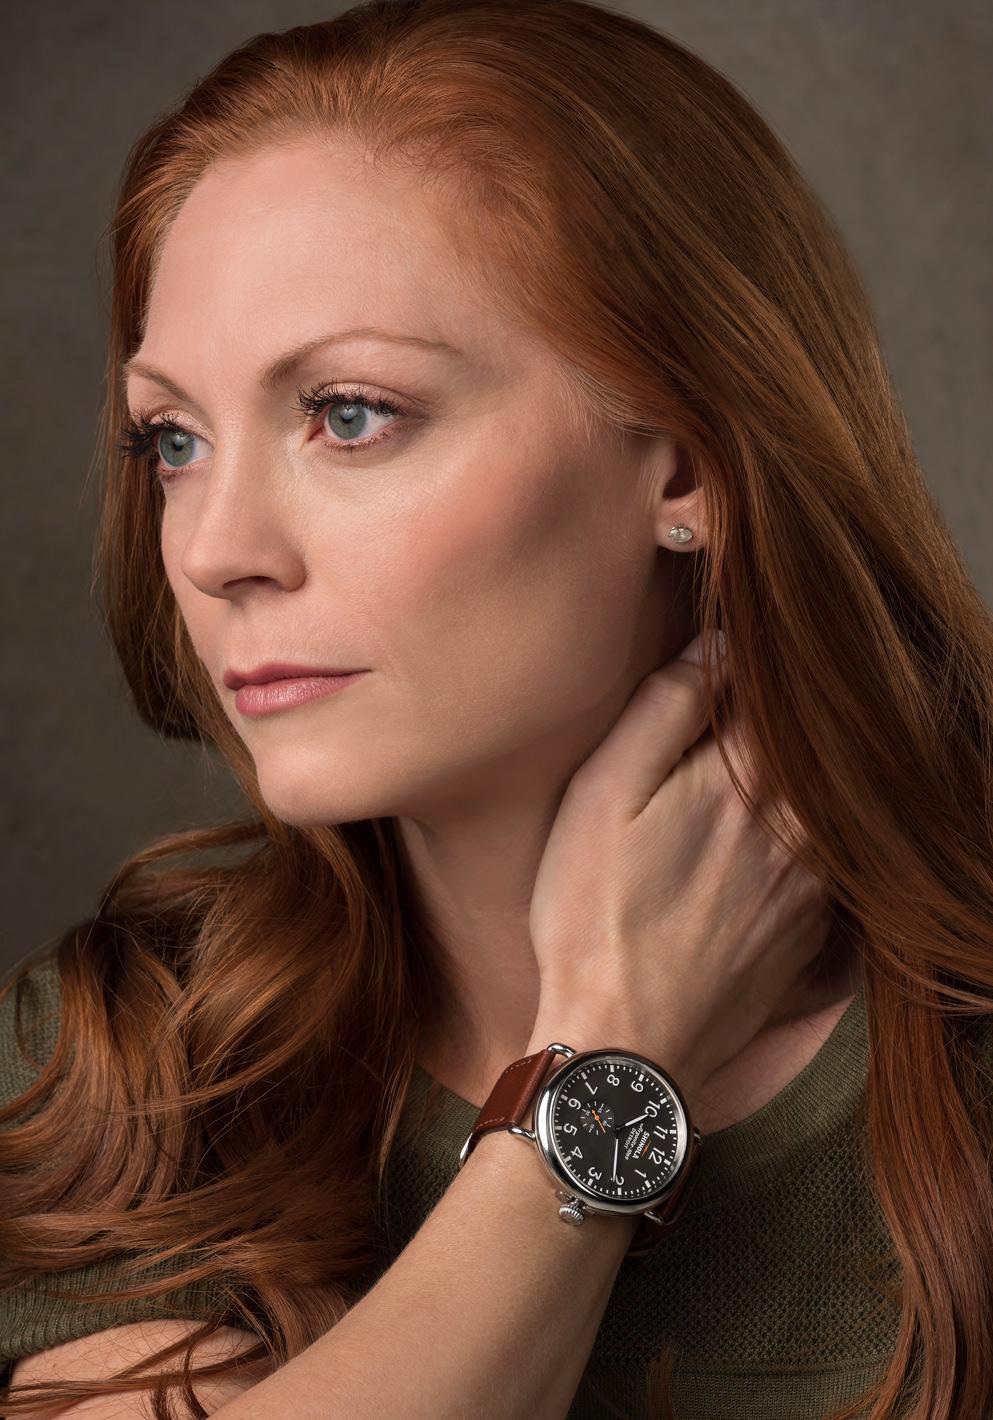 fashion model wearing a shinola watch